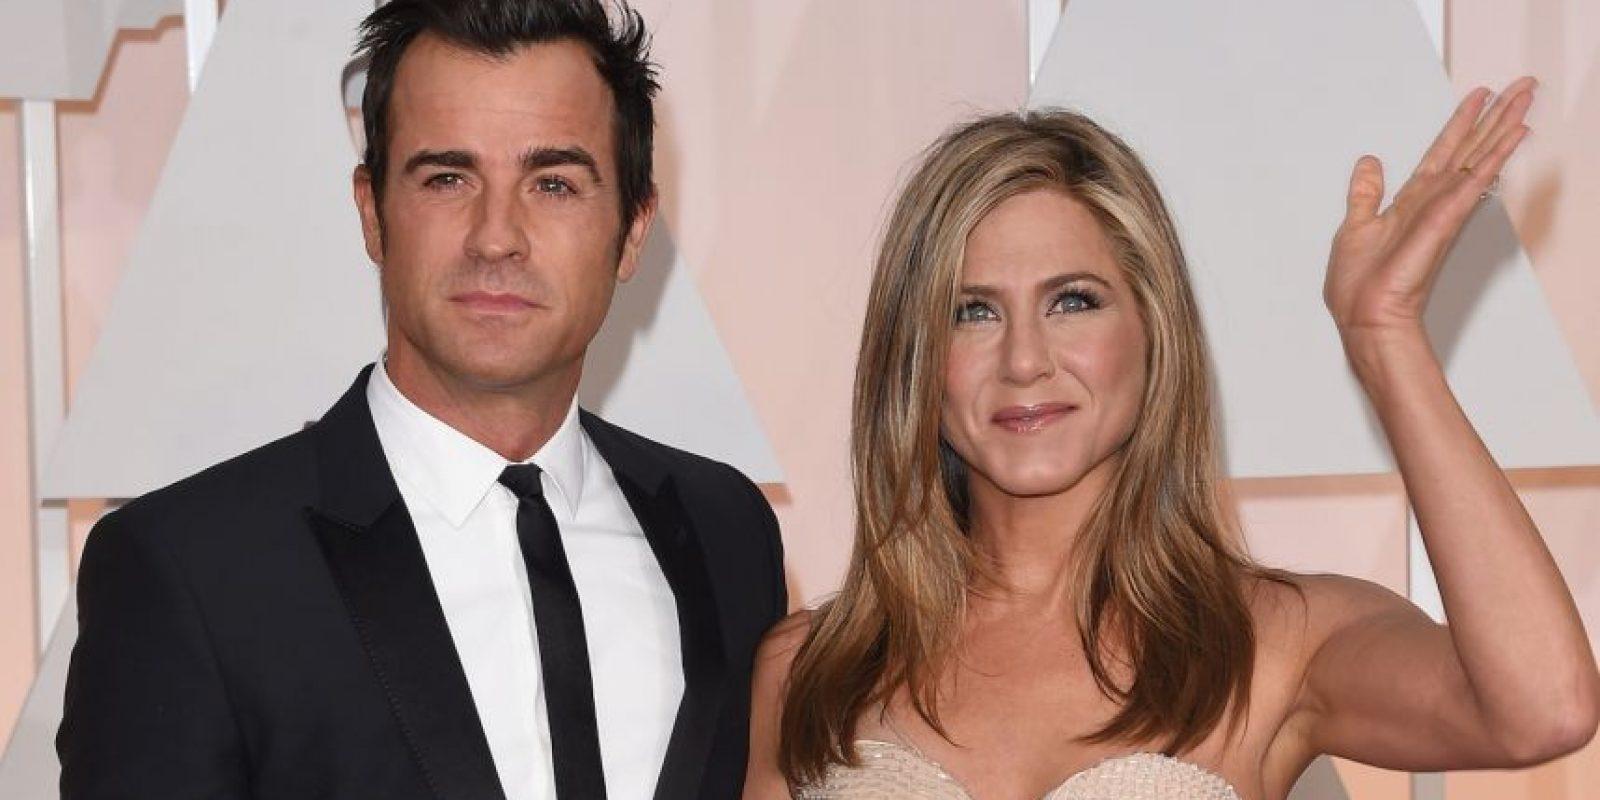 Jennifer Aniston y Theroux comenzaron a salir en mayo de 2011. Foto:Getty Images